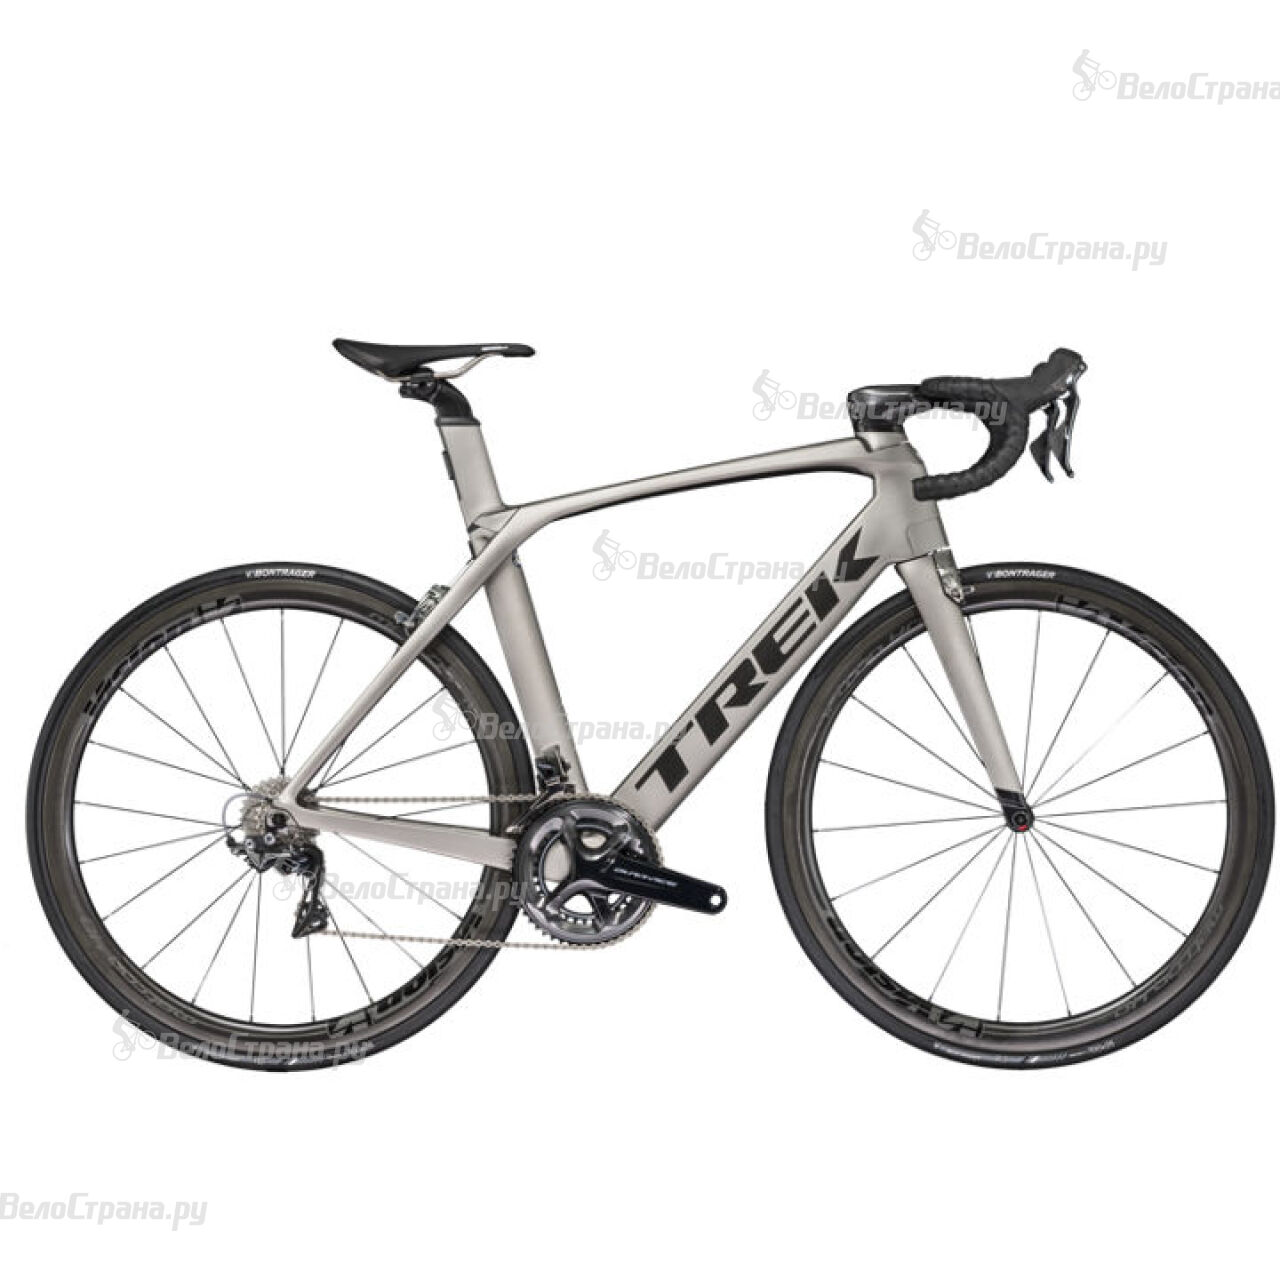 Велосипед Trek MADONE 9.5 C H2 (2017) велосипед trek madone 9 5 c wsd udi2 2017